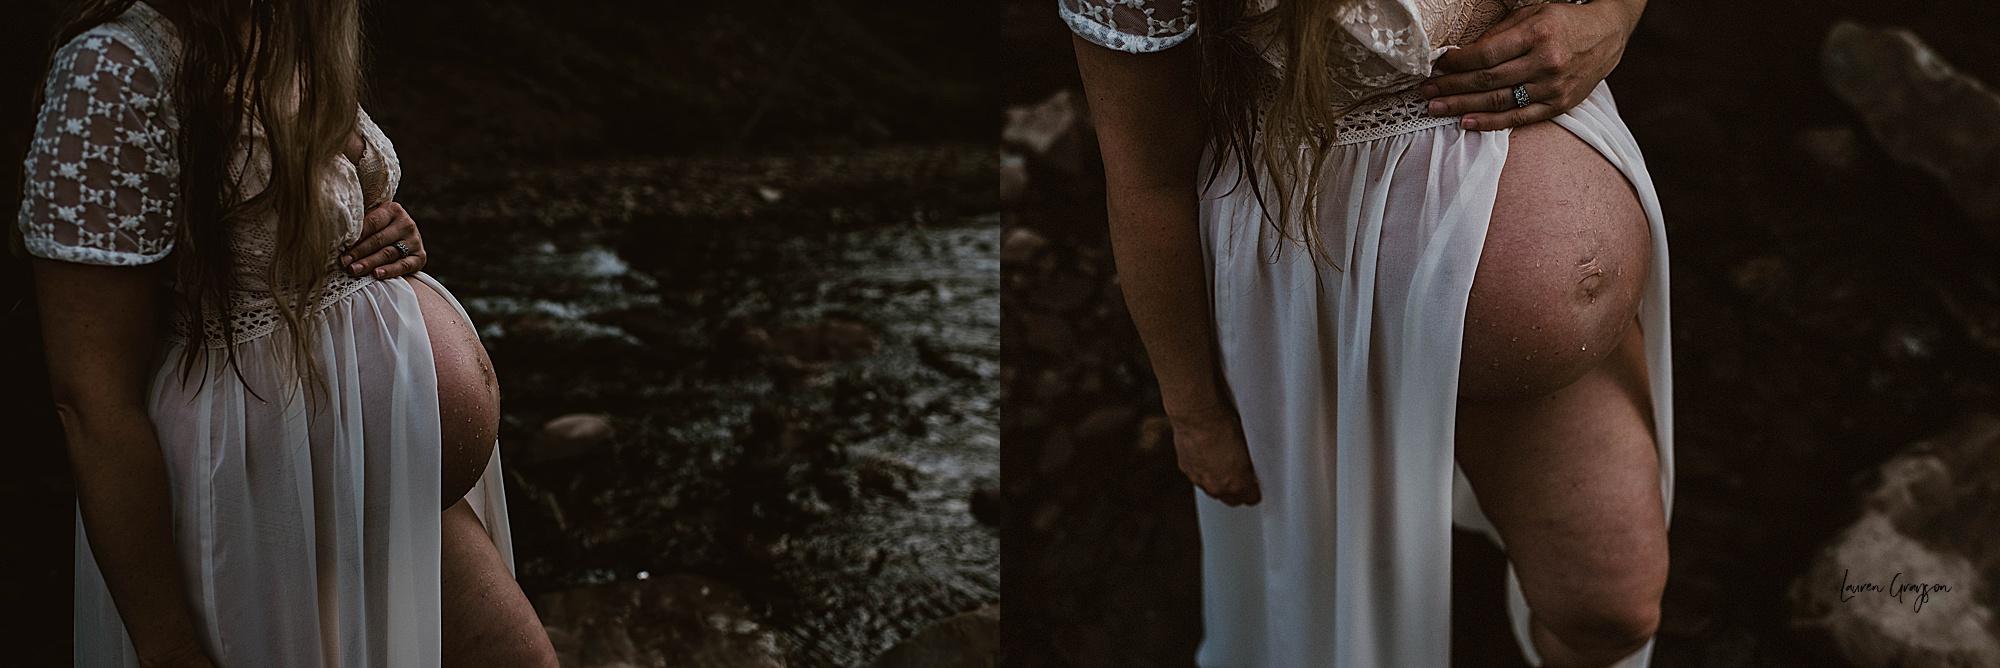 lauren-grayson-photography-akron-ohio-maternity-photographer-waterfall-sarah-f_0029.jpg